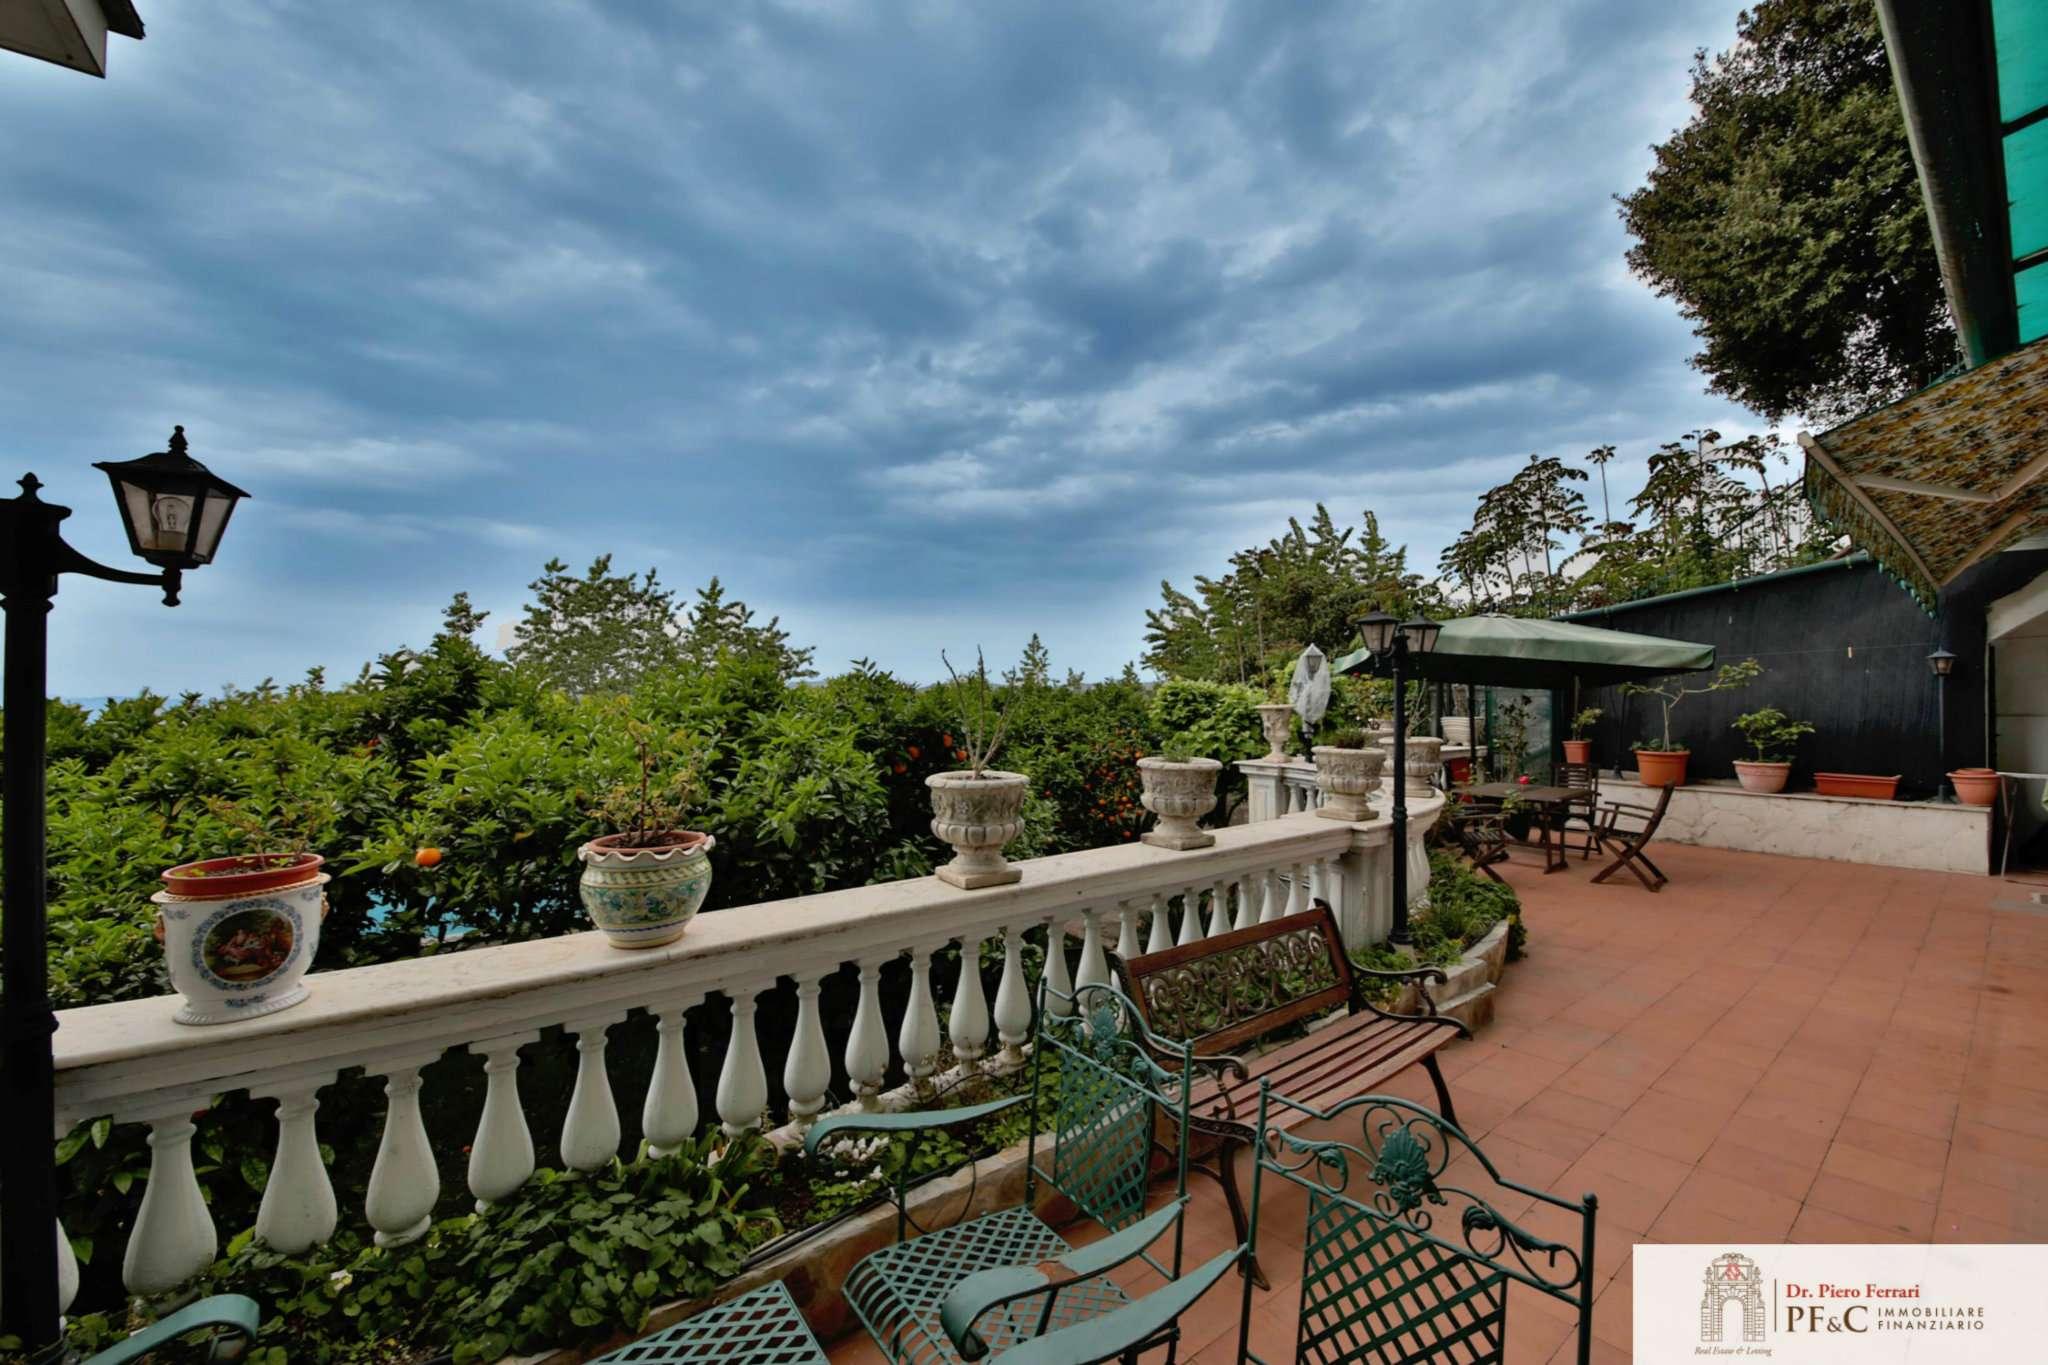 Appartamento panoramico di charme con piscina e giardino panoramico.